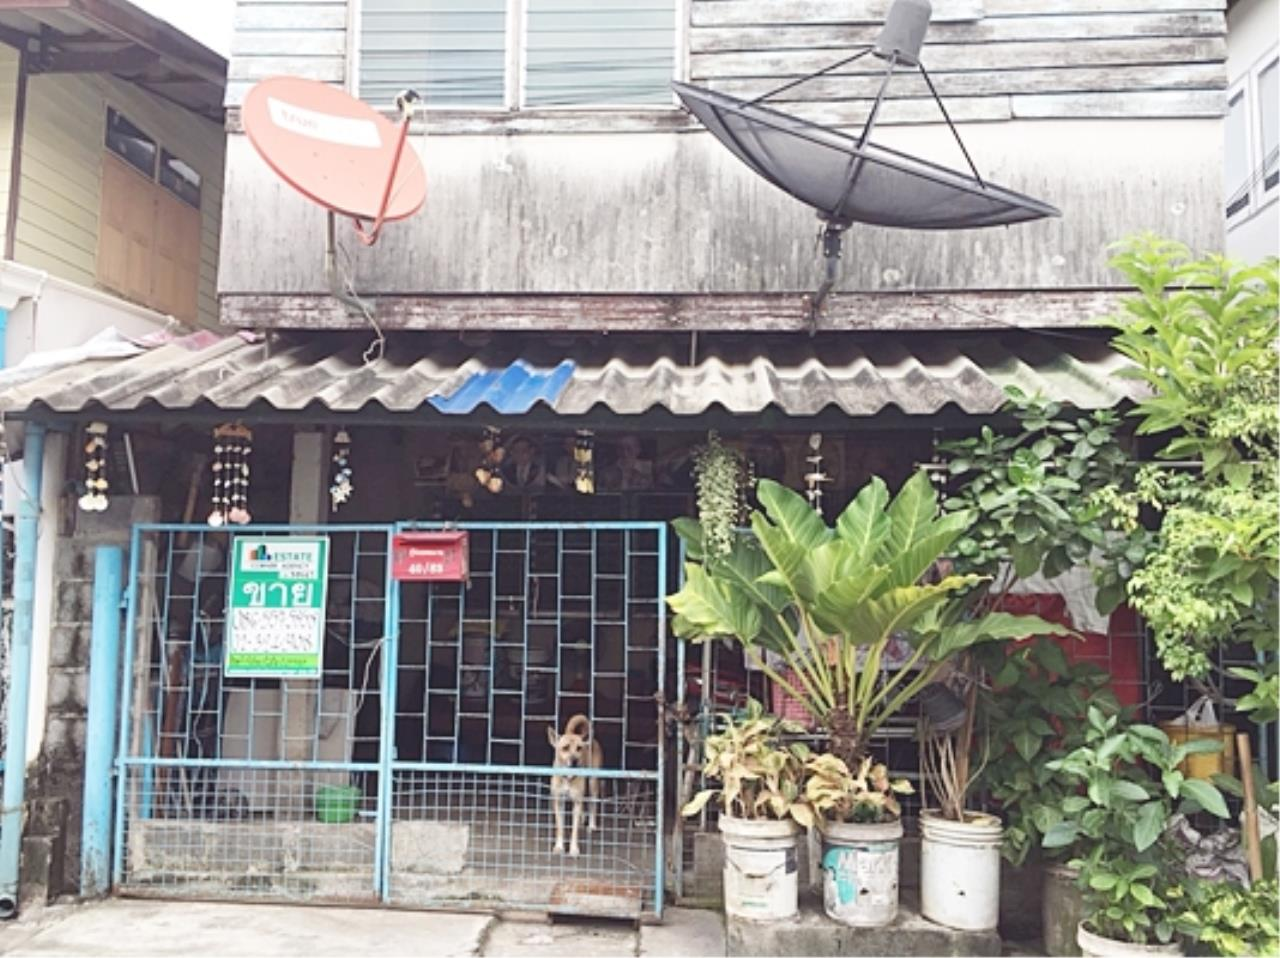 Estate Corner Agency (Samut Prakan) Agency's Sale House with land near Soi Sukapiban 2 near mega Bangna. 2